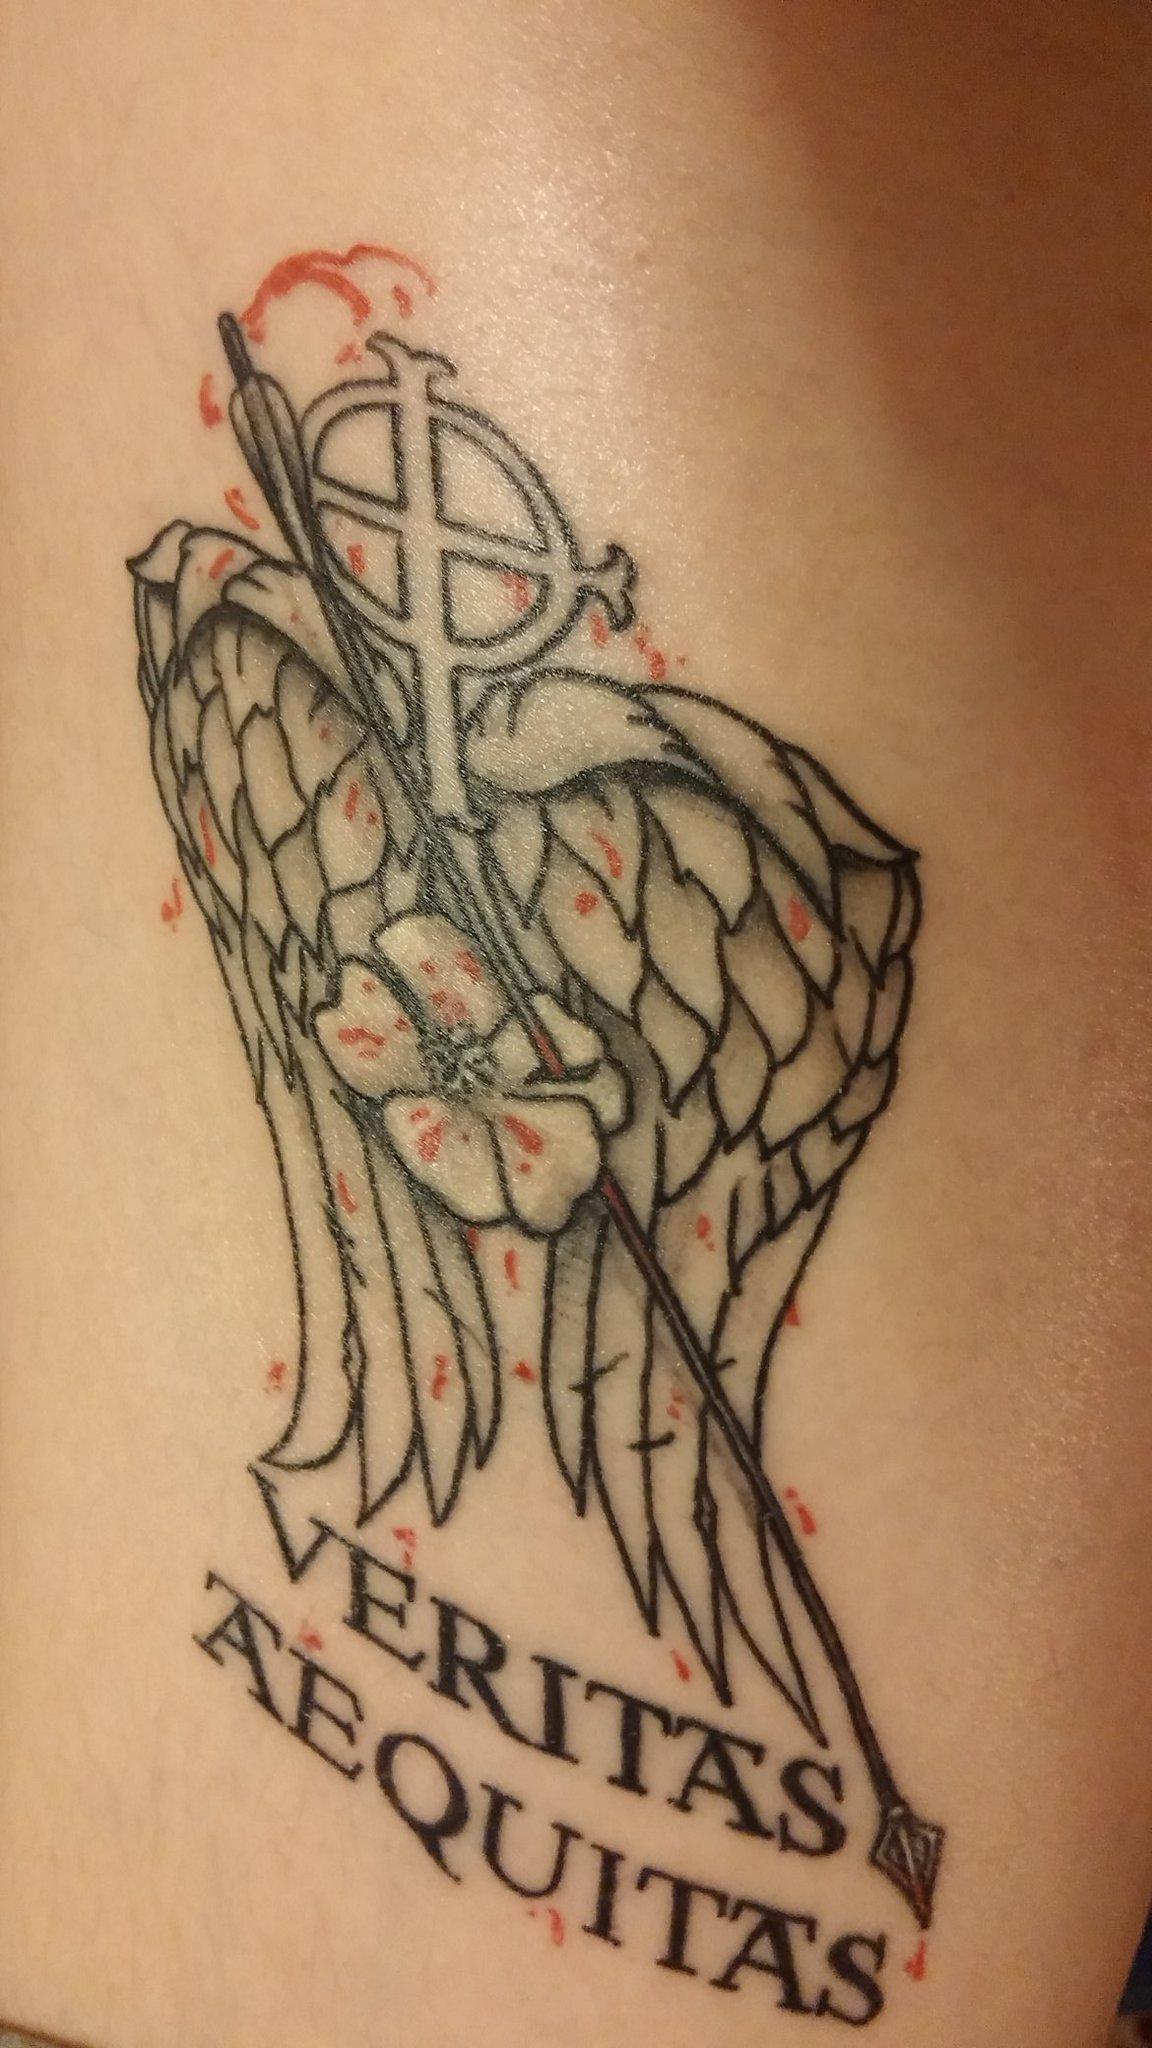 My tattoo! ❤ #brothers #TheWalkingDead #boondocksaints @seanflanery @wwwbigbaldhead @WalkingDead_AMC @BoondockSaints https://t.co/OOpPbwa1Tf